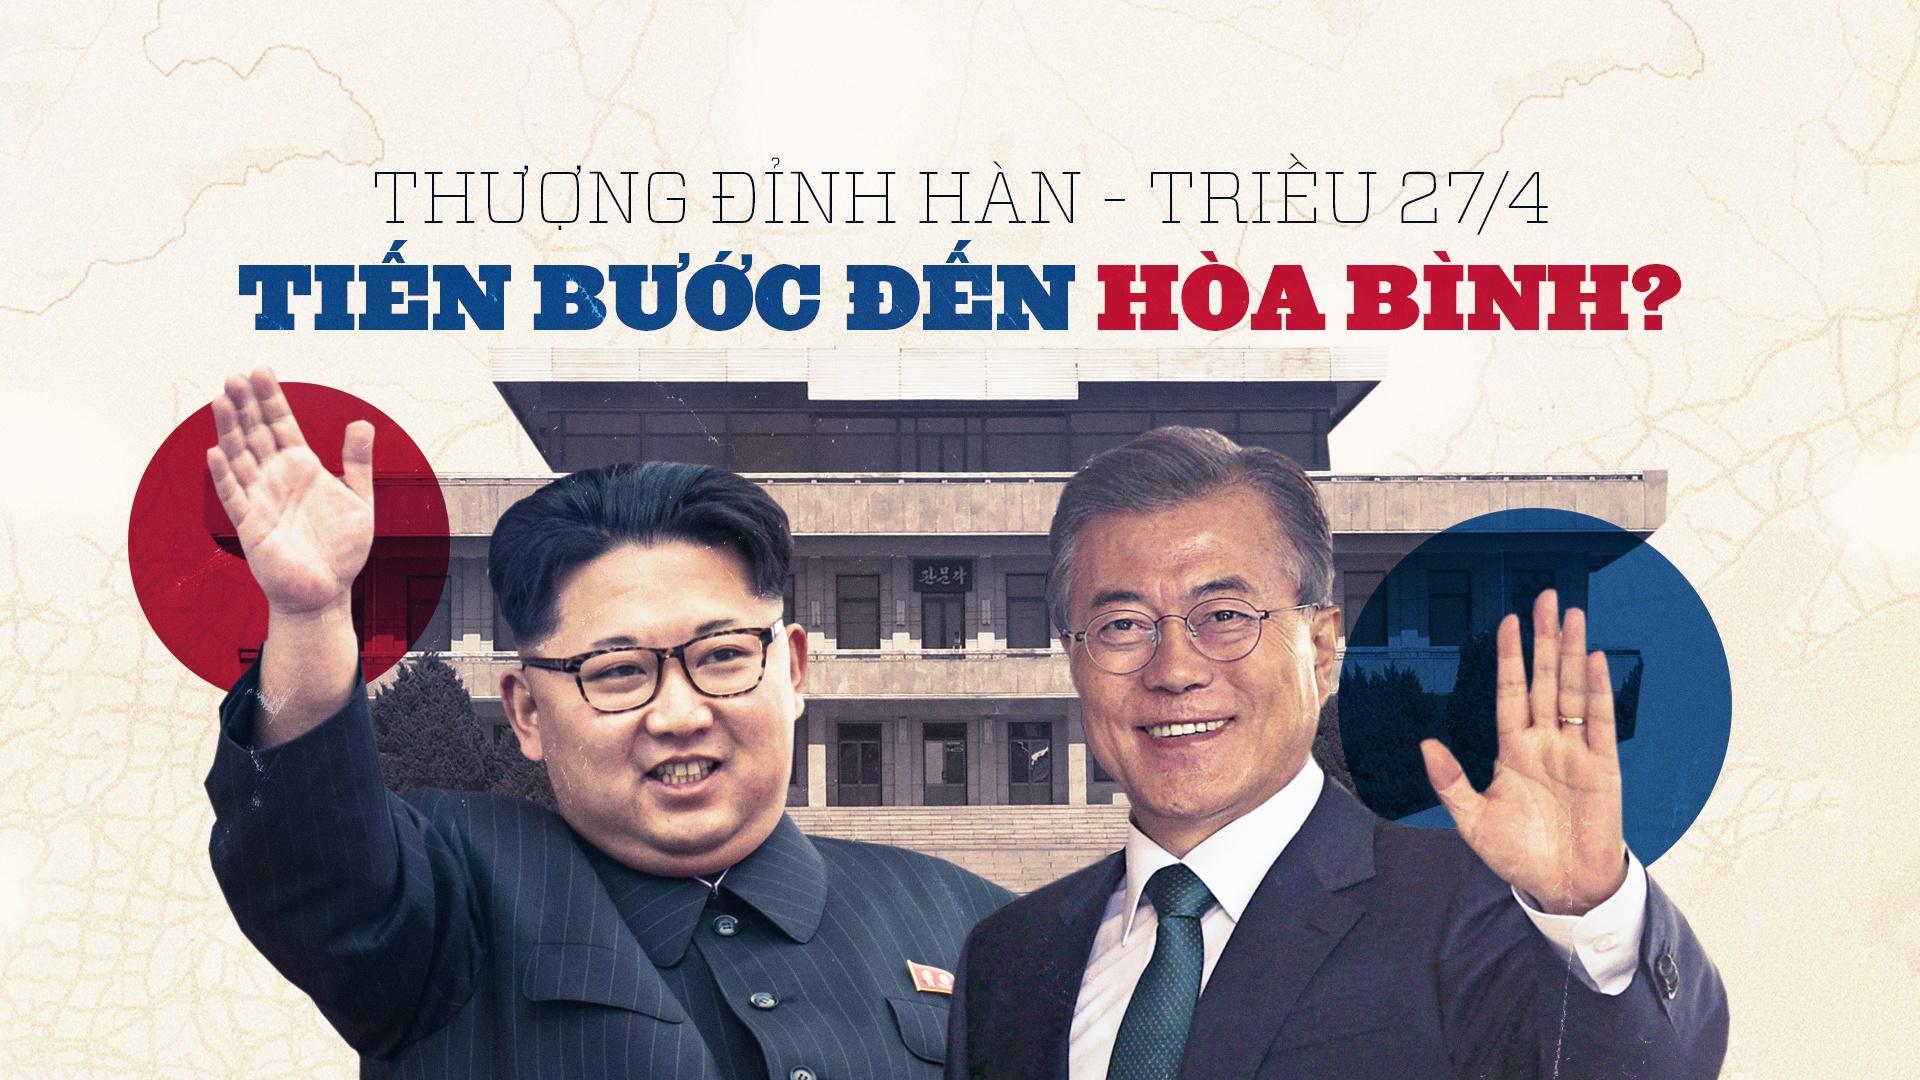 Thuong dinh Han - Trieu: 'Cuoc chien' 70 nam den hoi khep lai? hinh anh 2